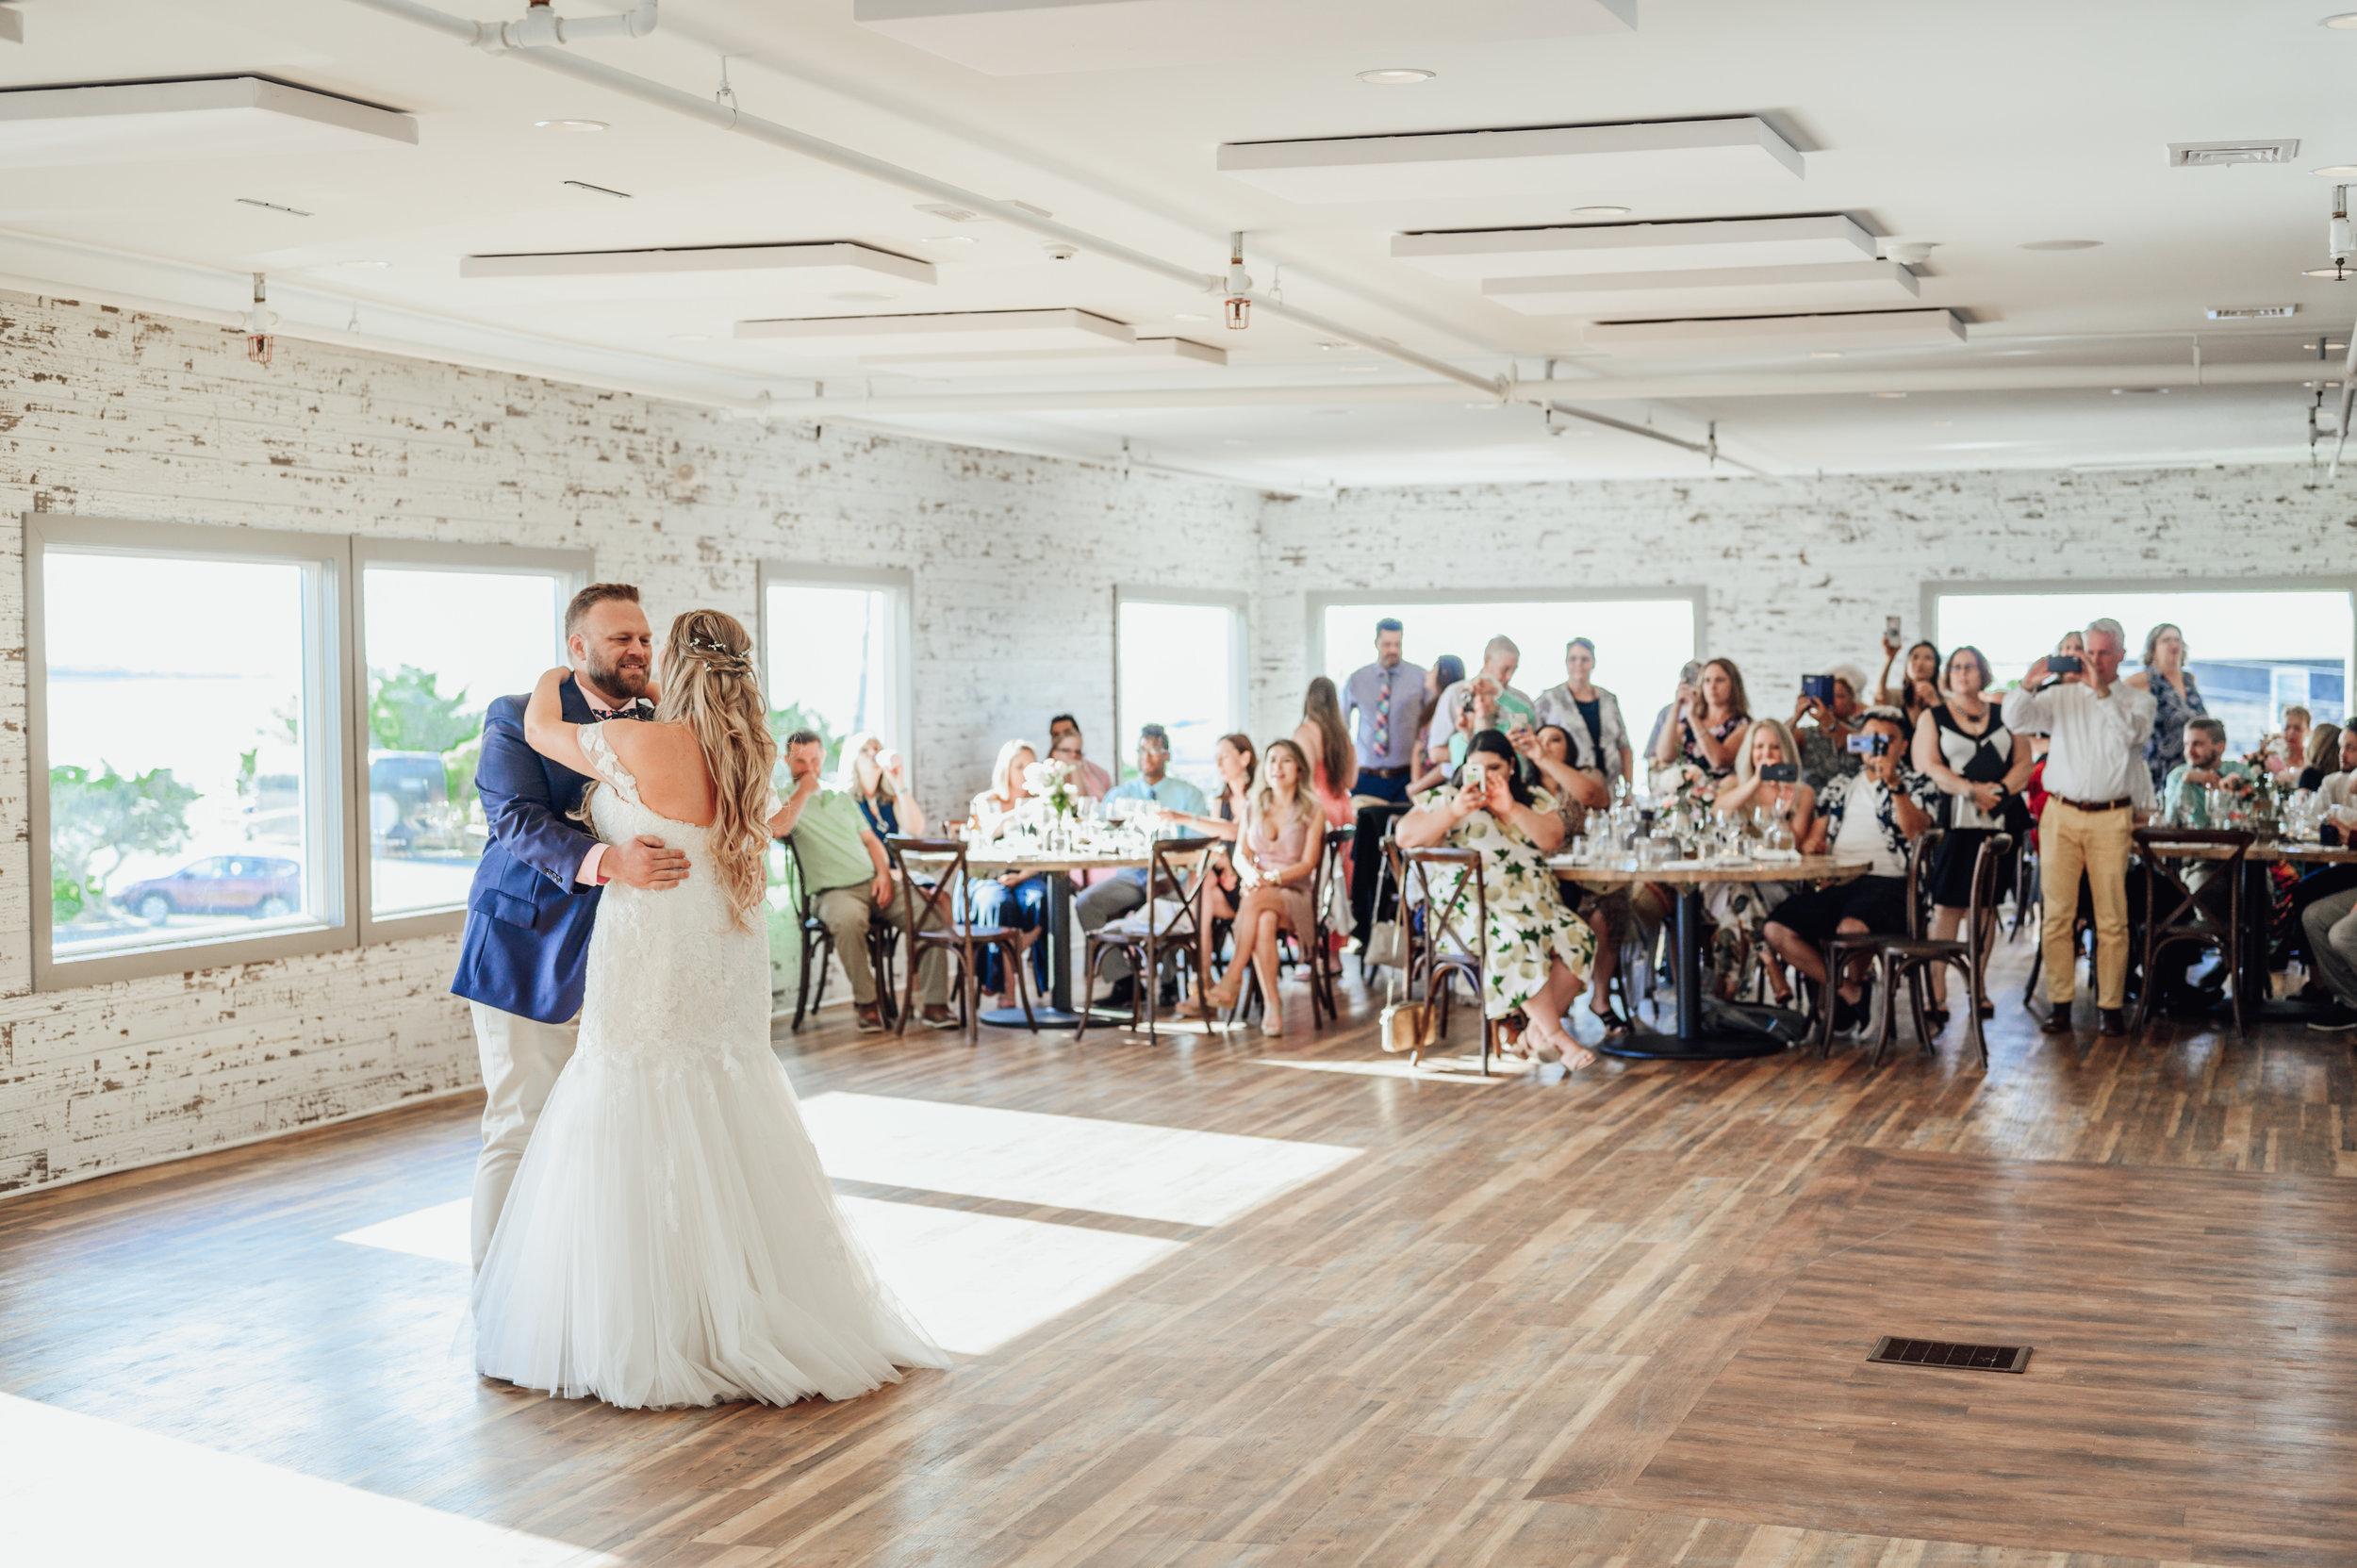 New Jersey Wedding Photographer, Felsberg Photography LBI wedding photography 90.jpg